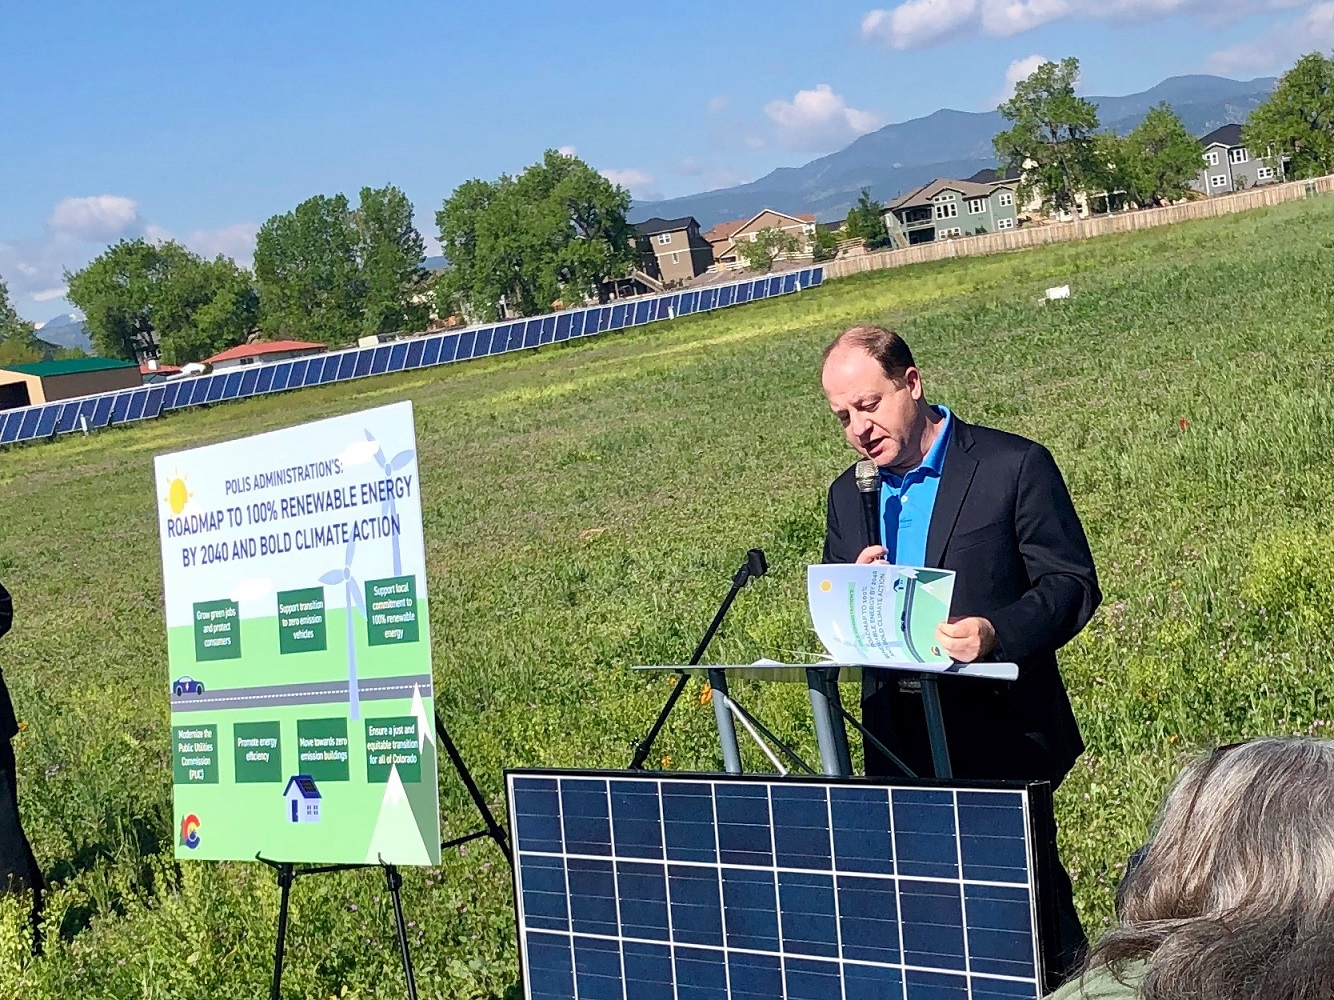 Colorado Governor Jared Polis to Sign Clean Energy Bills into Law